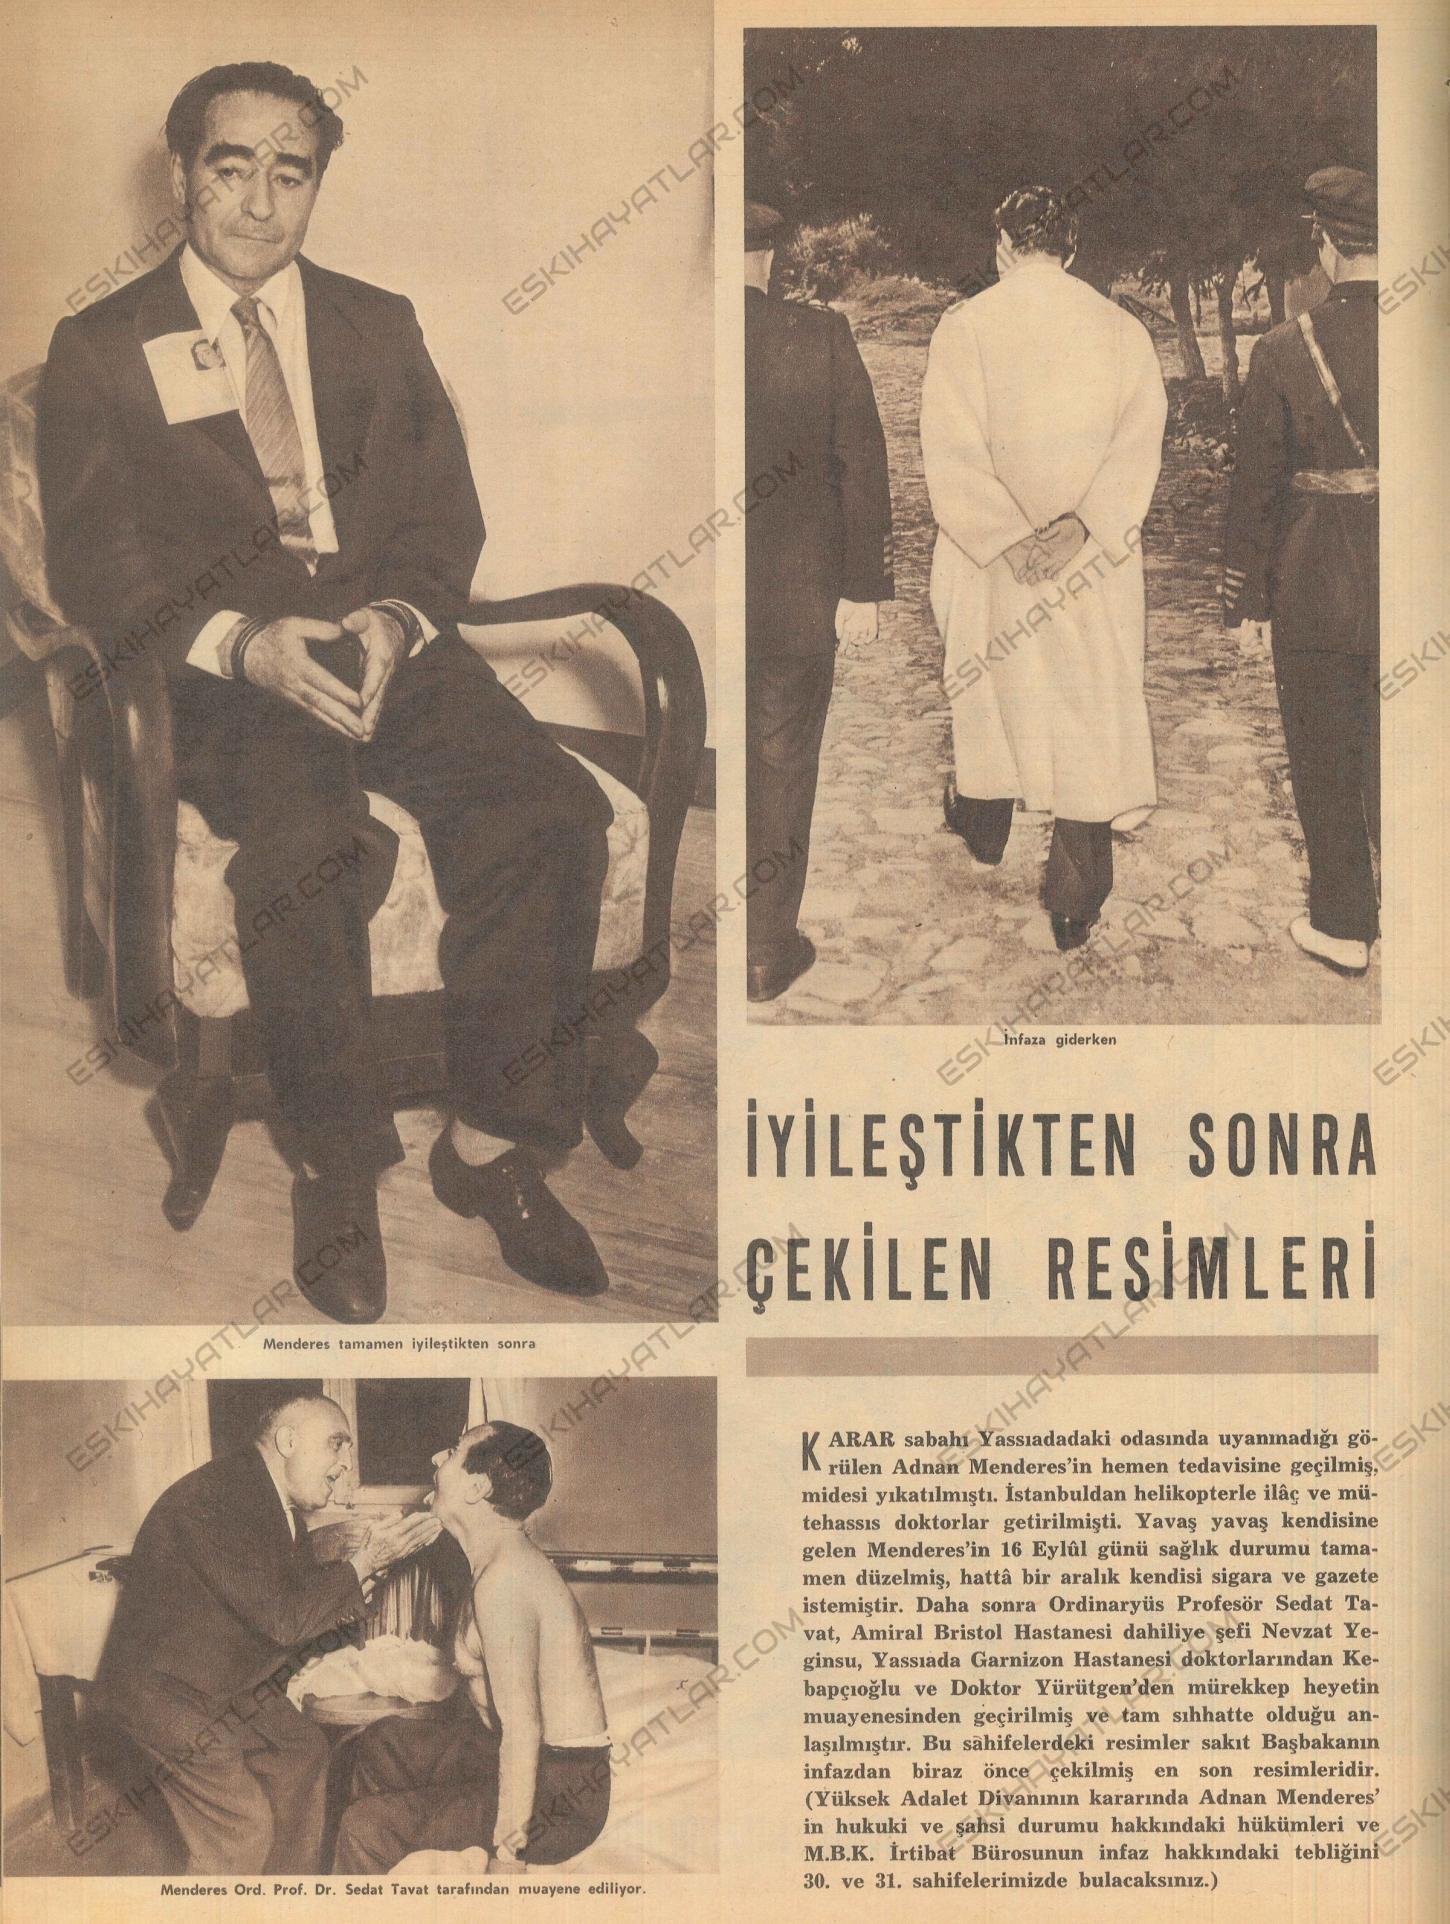 1960-ihtilali-idam-edilenler-adnan-menderes-hasan-polatkan-fatin-rustu-zorlu-yassiada-tutanaklari-1961-hayat-dergisi-arsivleri (19)